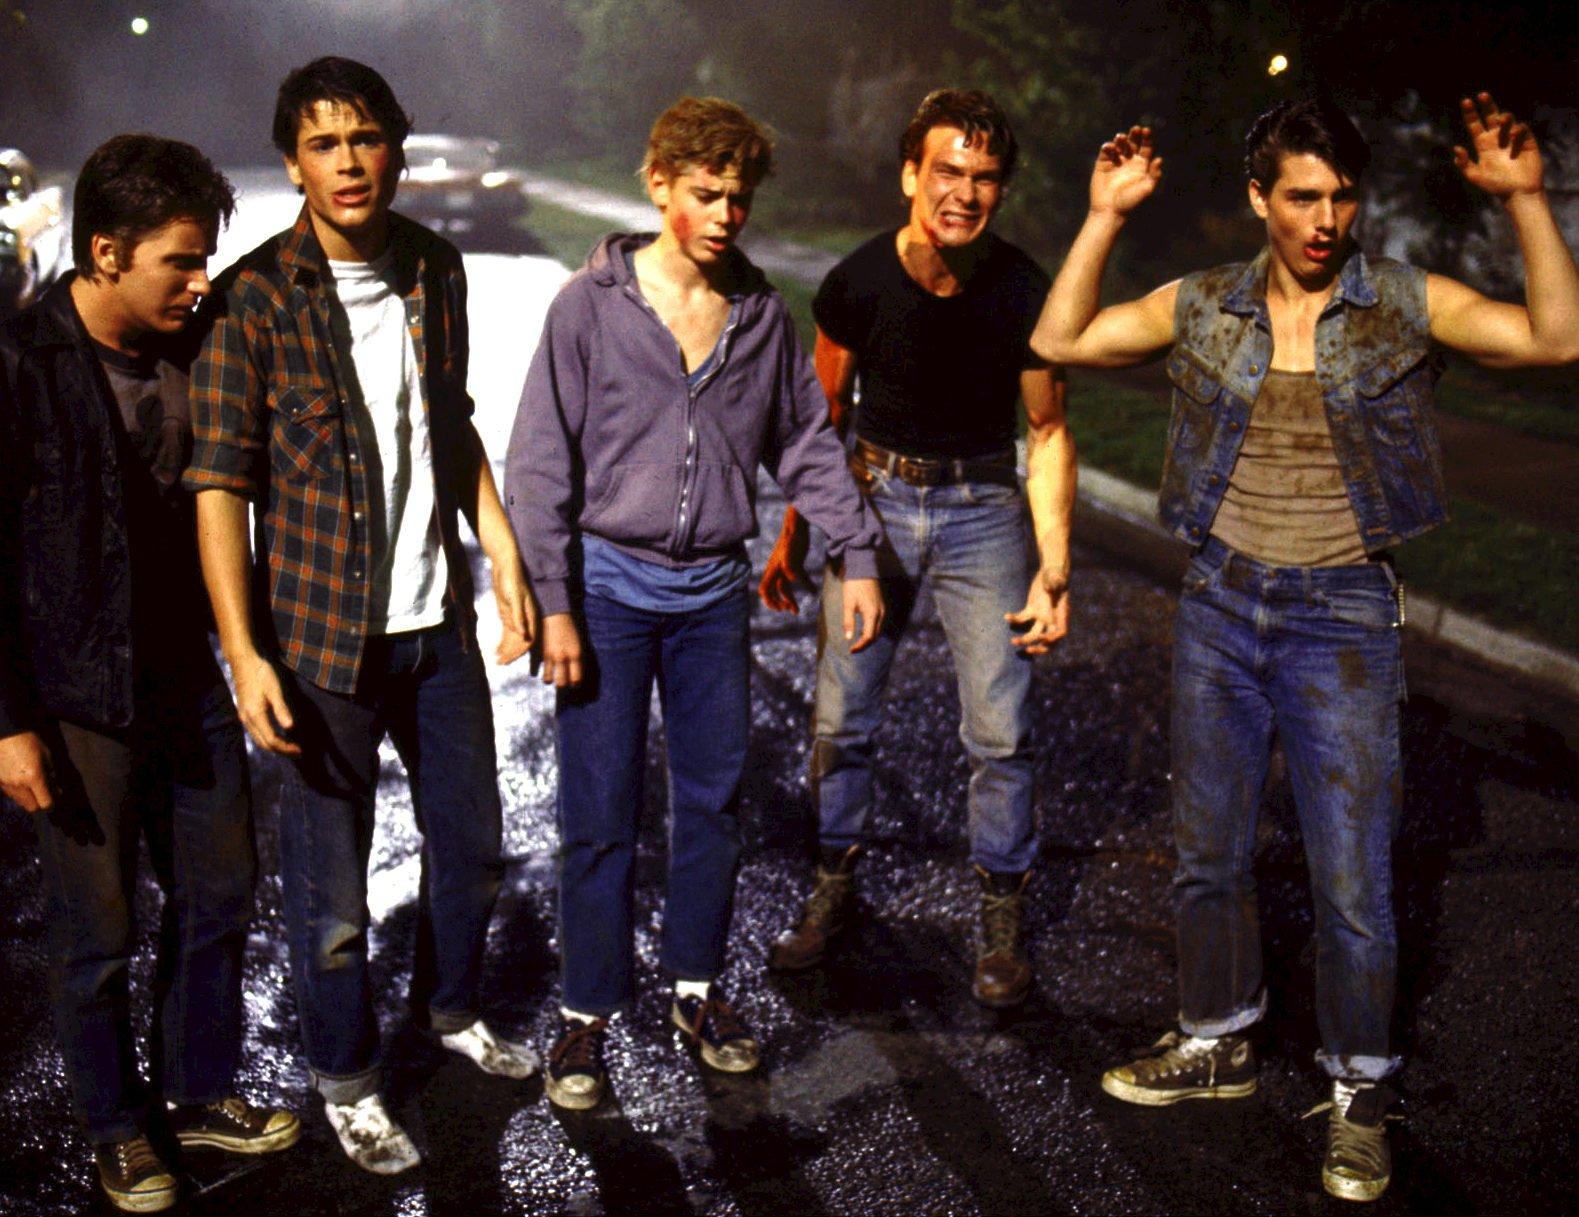 MV5BMTYyMDkwNzI2N15BMl5BanBnXkFtZTcwNzQzMjEyMw@@. V1 e1610638781598 20 Things You Probably Didn't Know About The 1983 Film The Outsiders